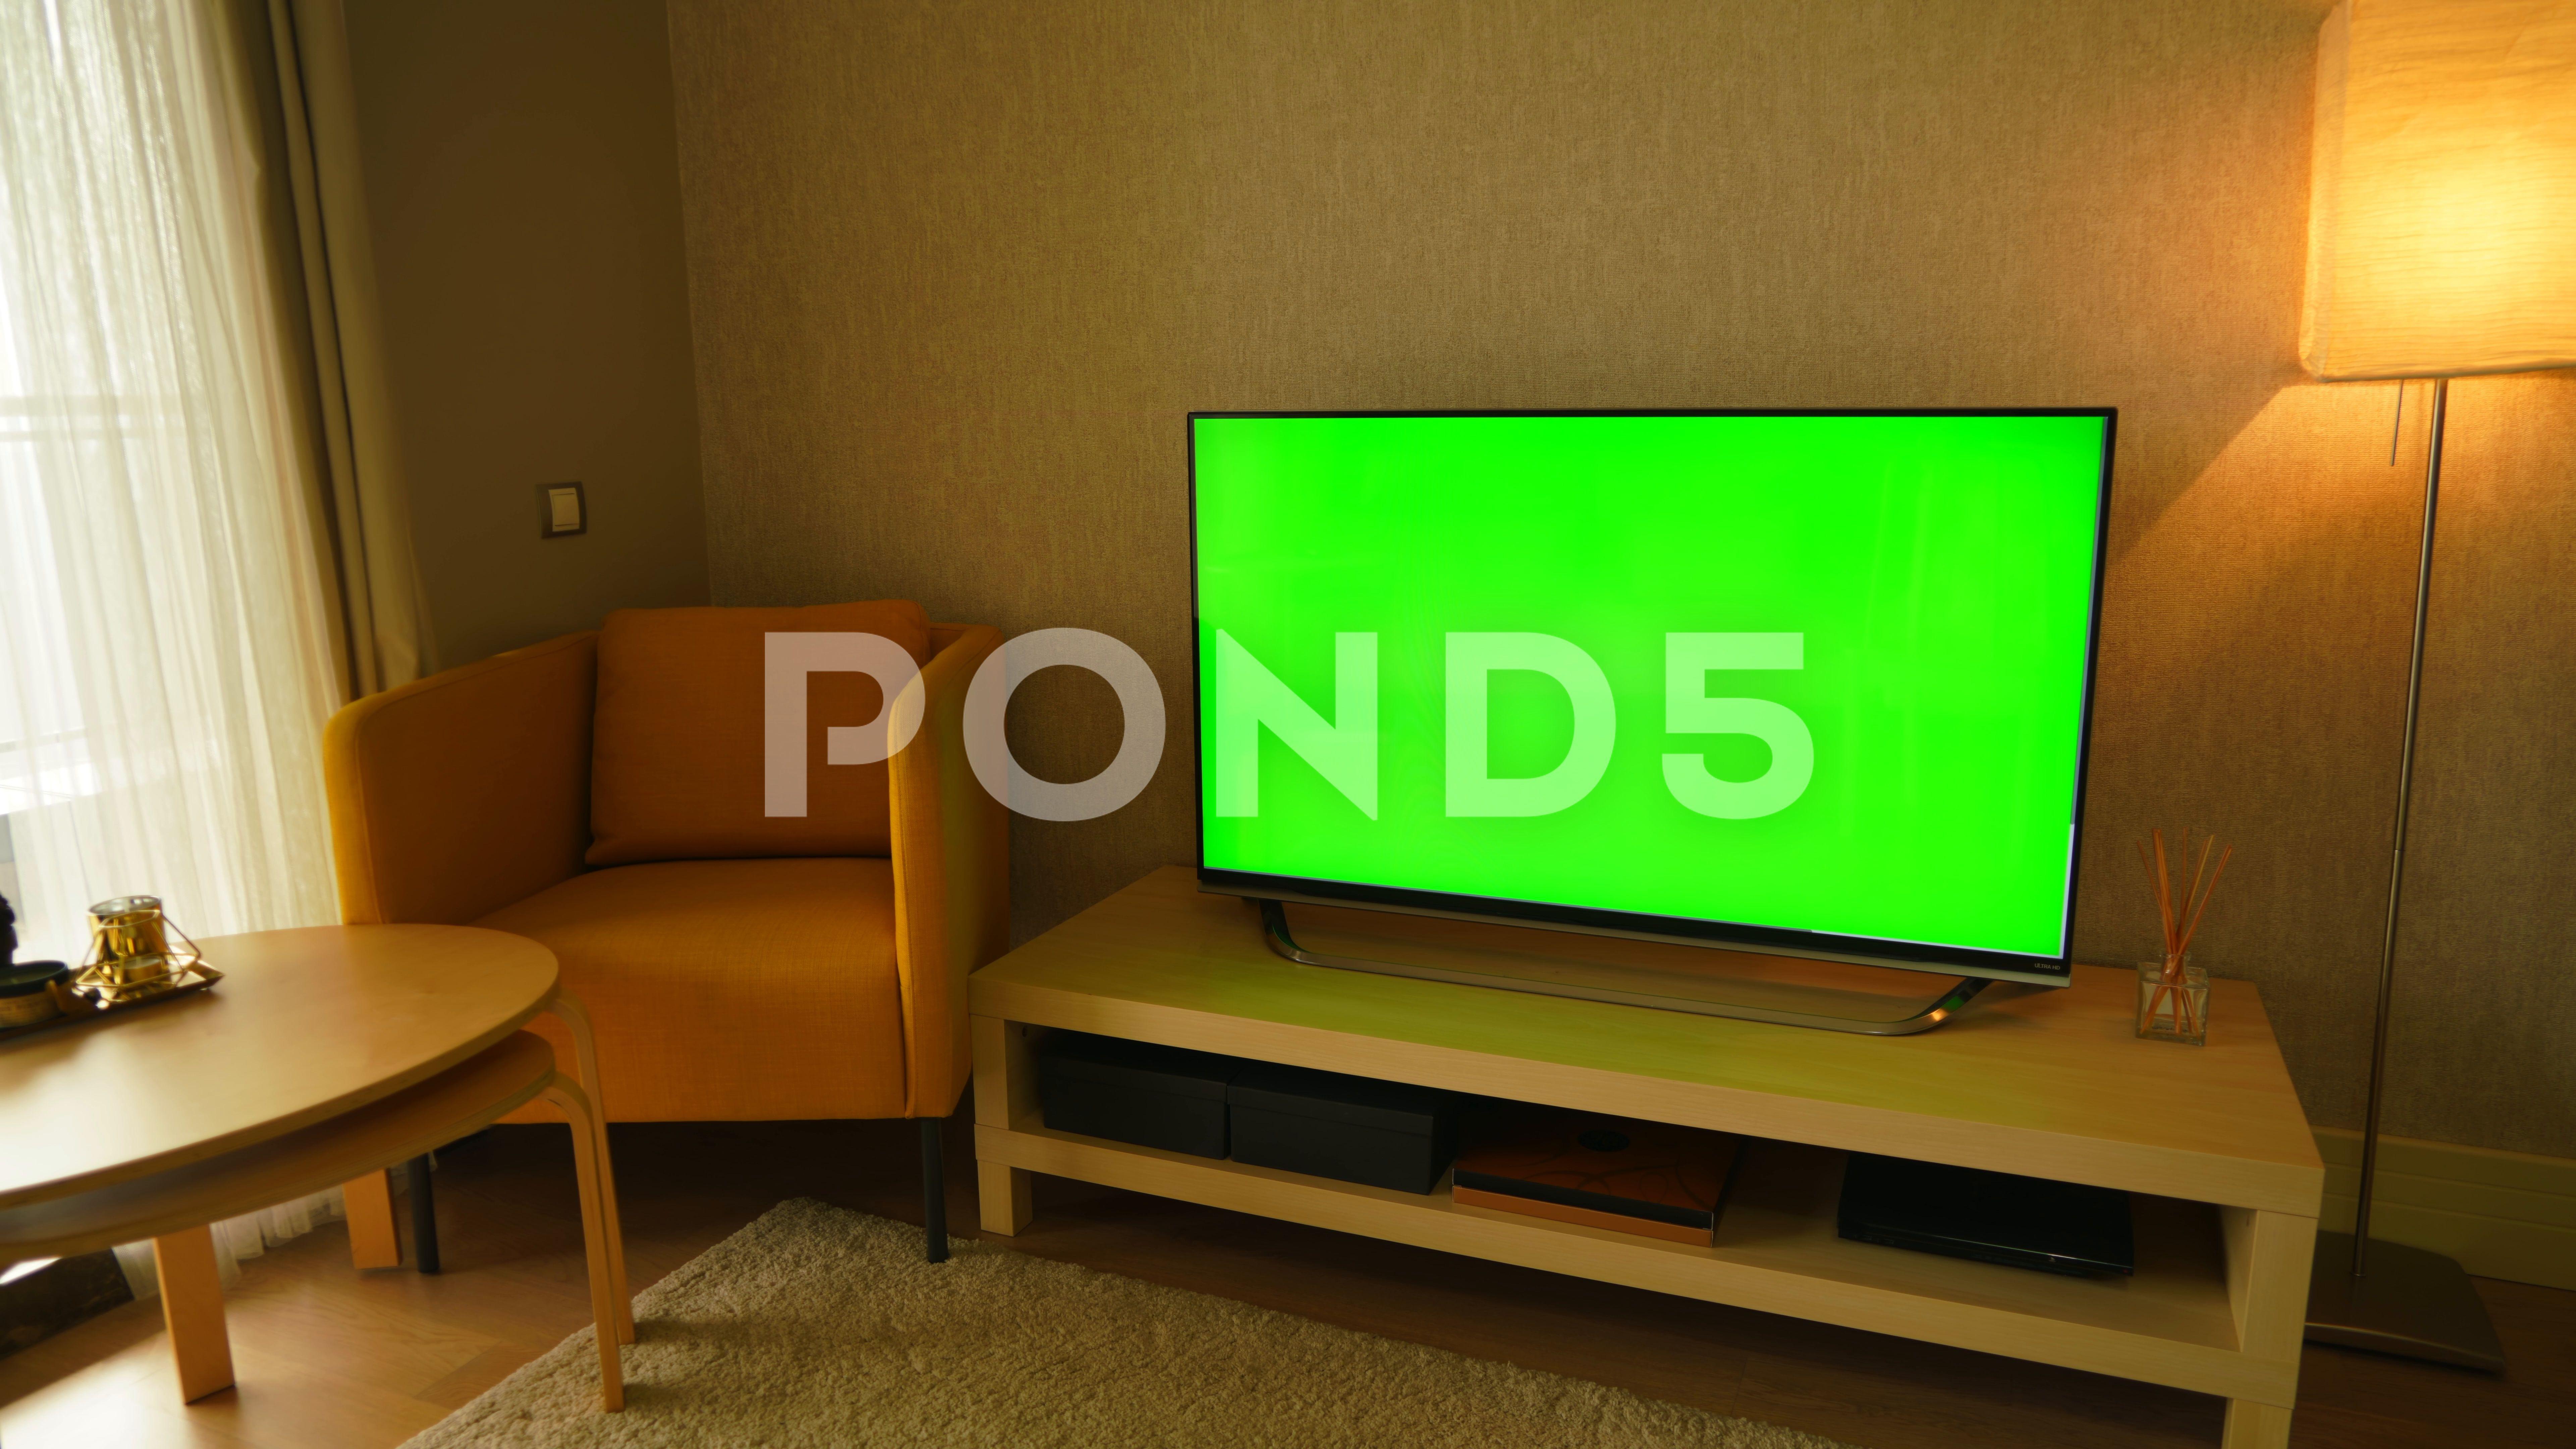 8k Green Screen Television 7680x4320 Ad Television Screen Green Footage Greenscreen Television Screen